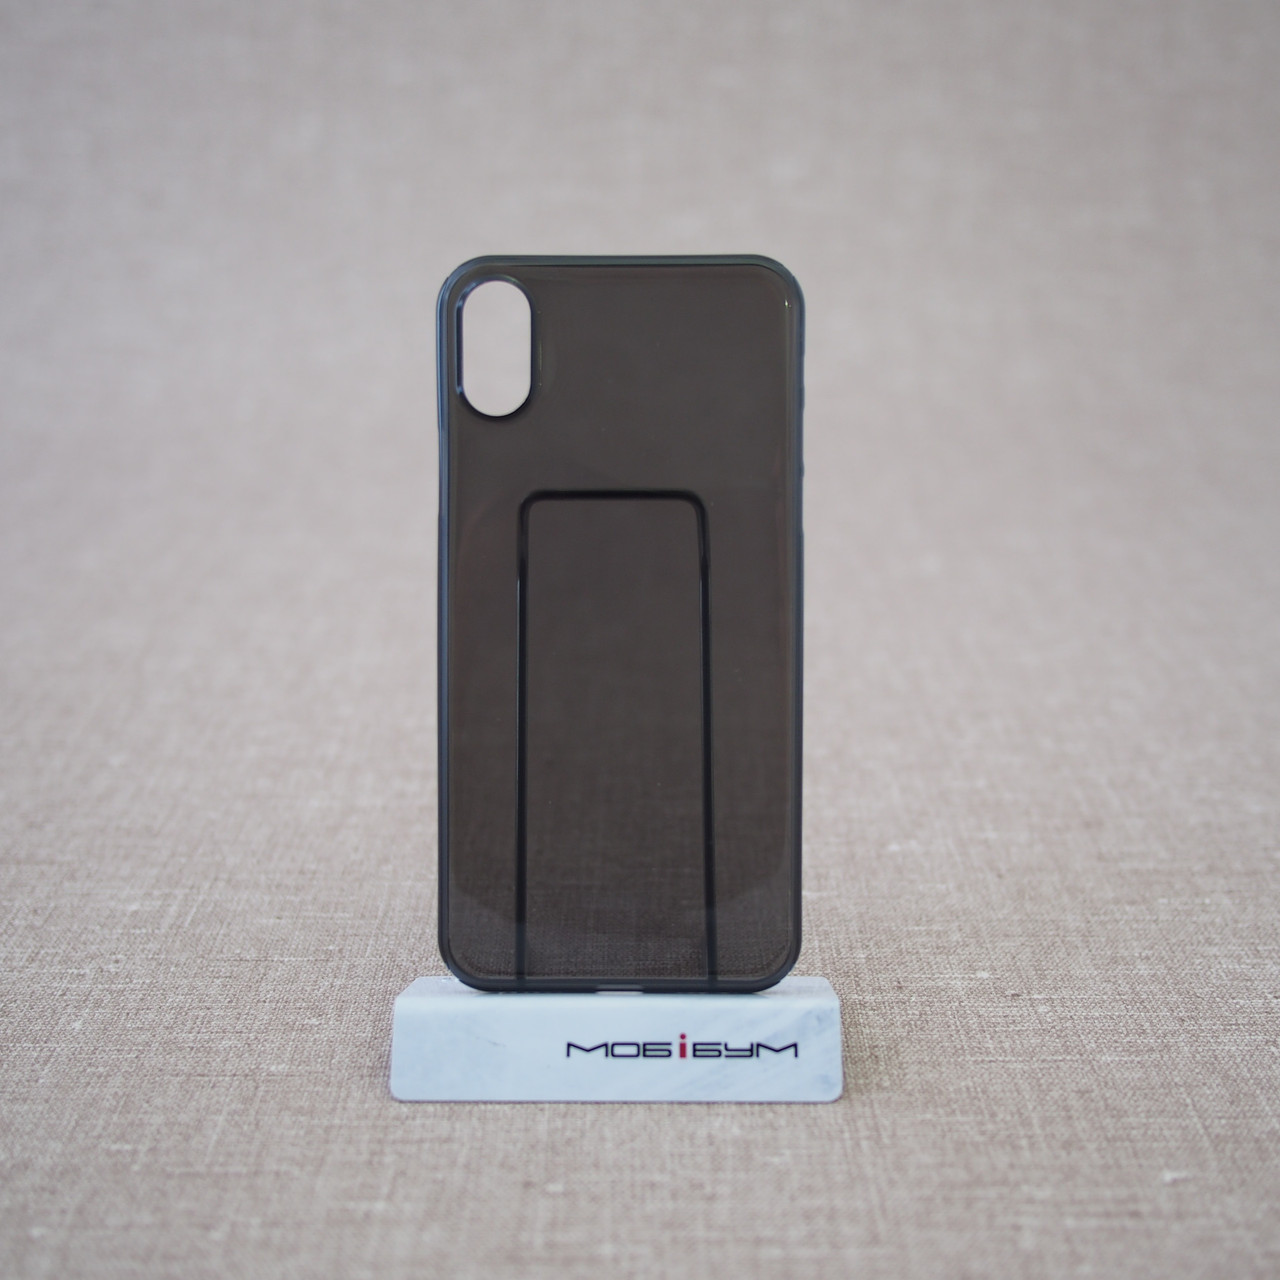 Чехол Moshi Superskin Exceptionally Thin iPhone X black (99MO111063) EAN/UPC: 4713057253966